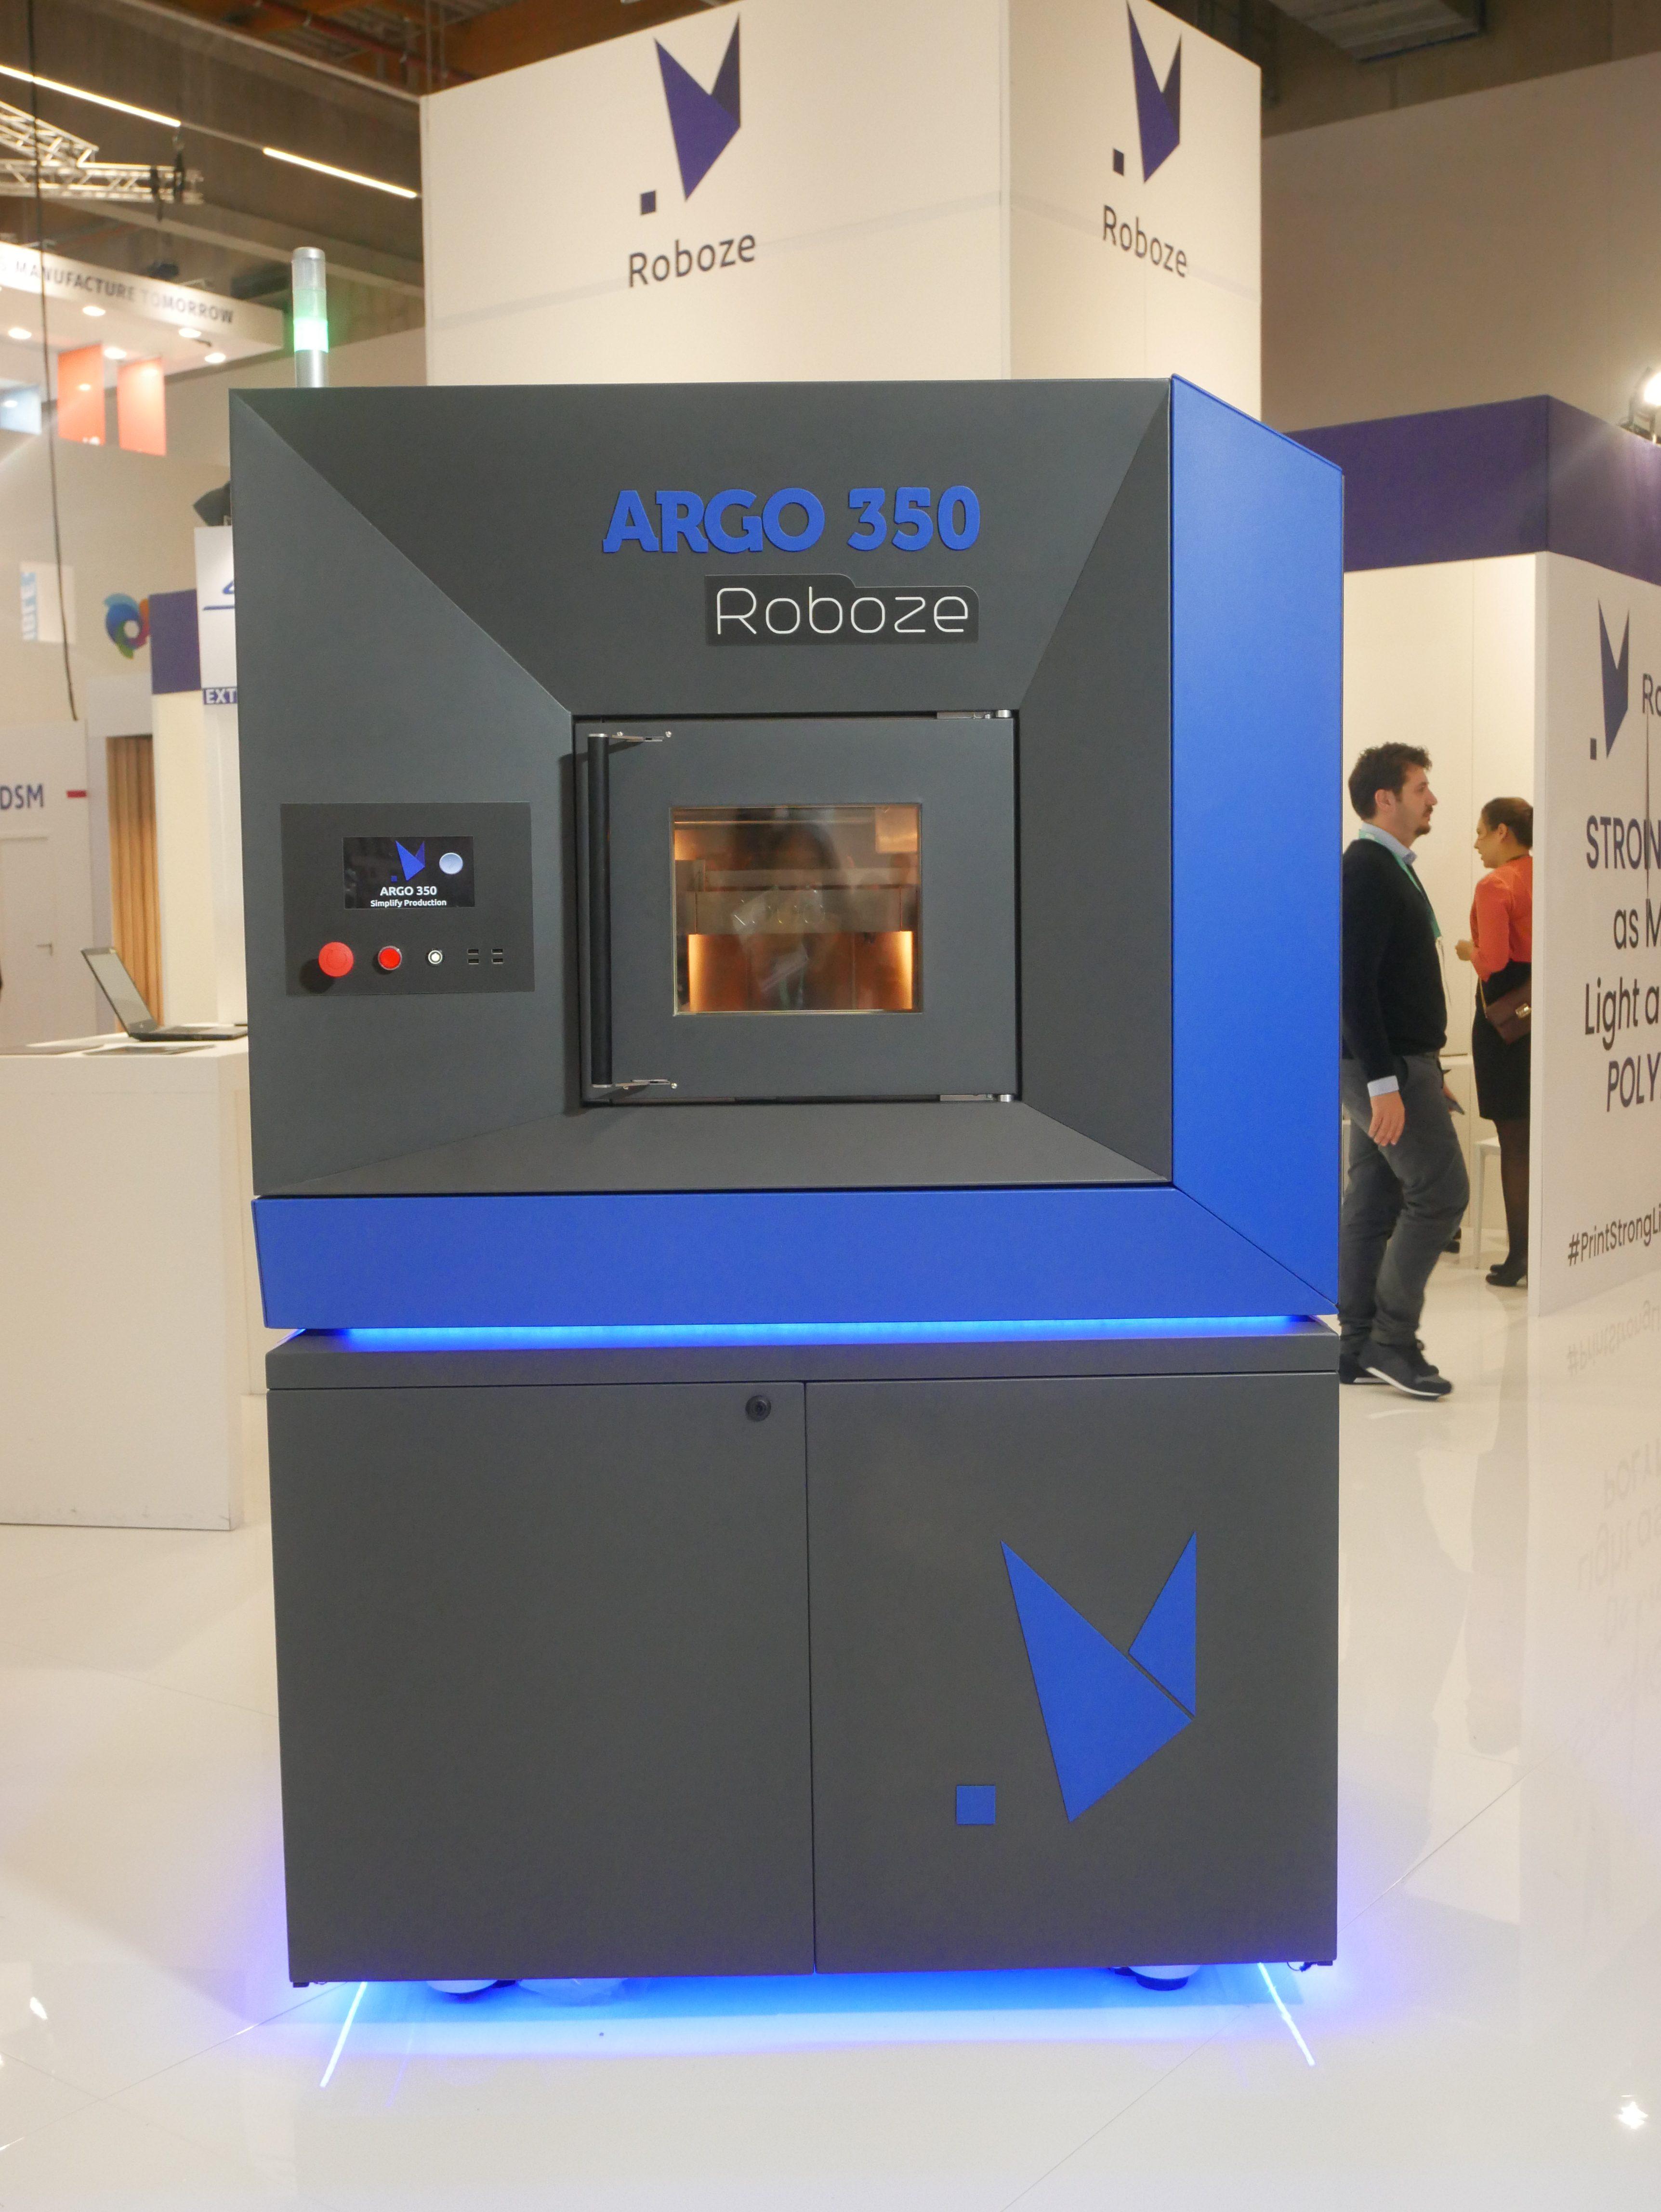 The ARGO 350 3D printer at Formnext 2019. Photo by Tia Vialva.